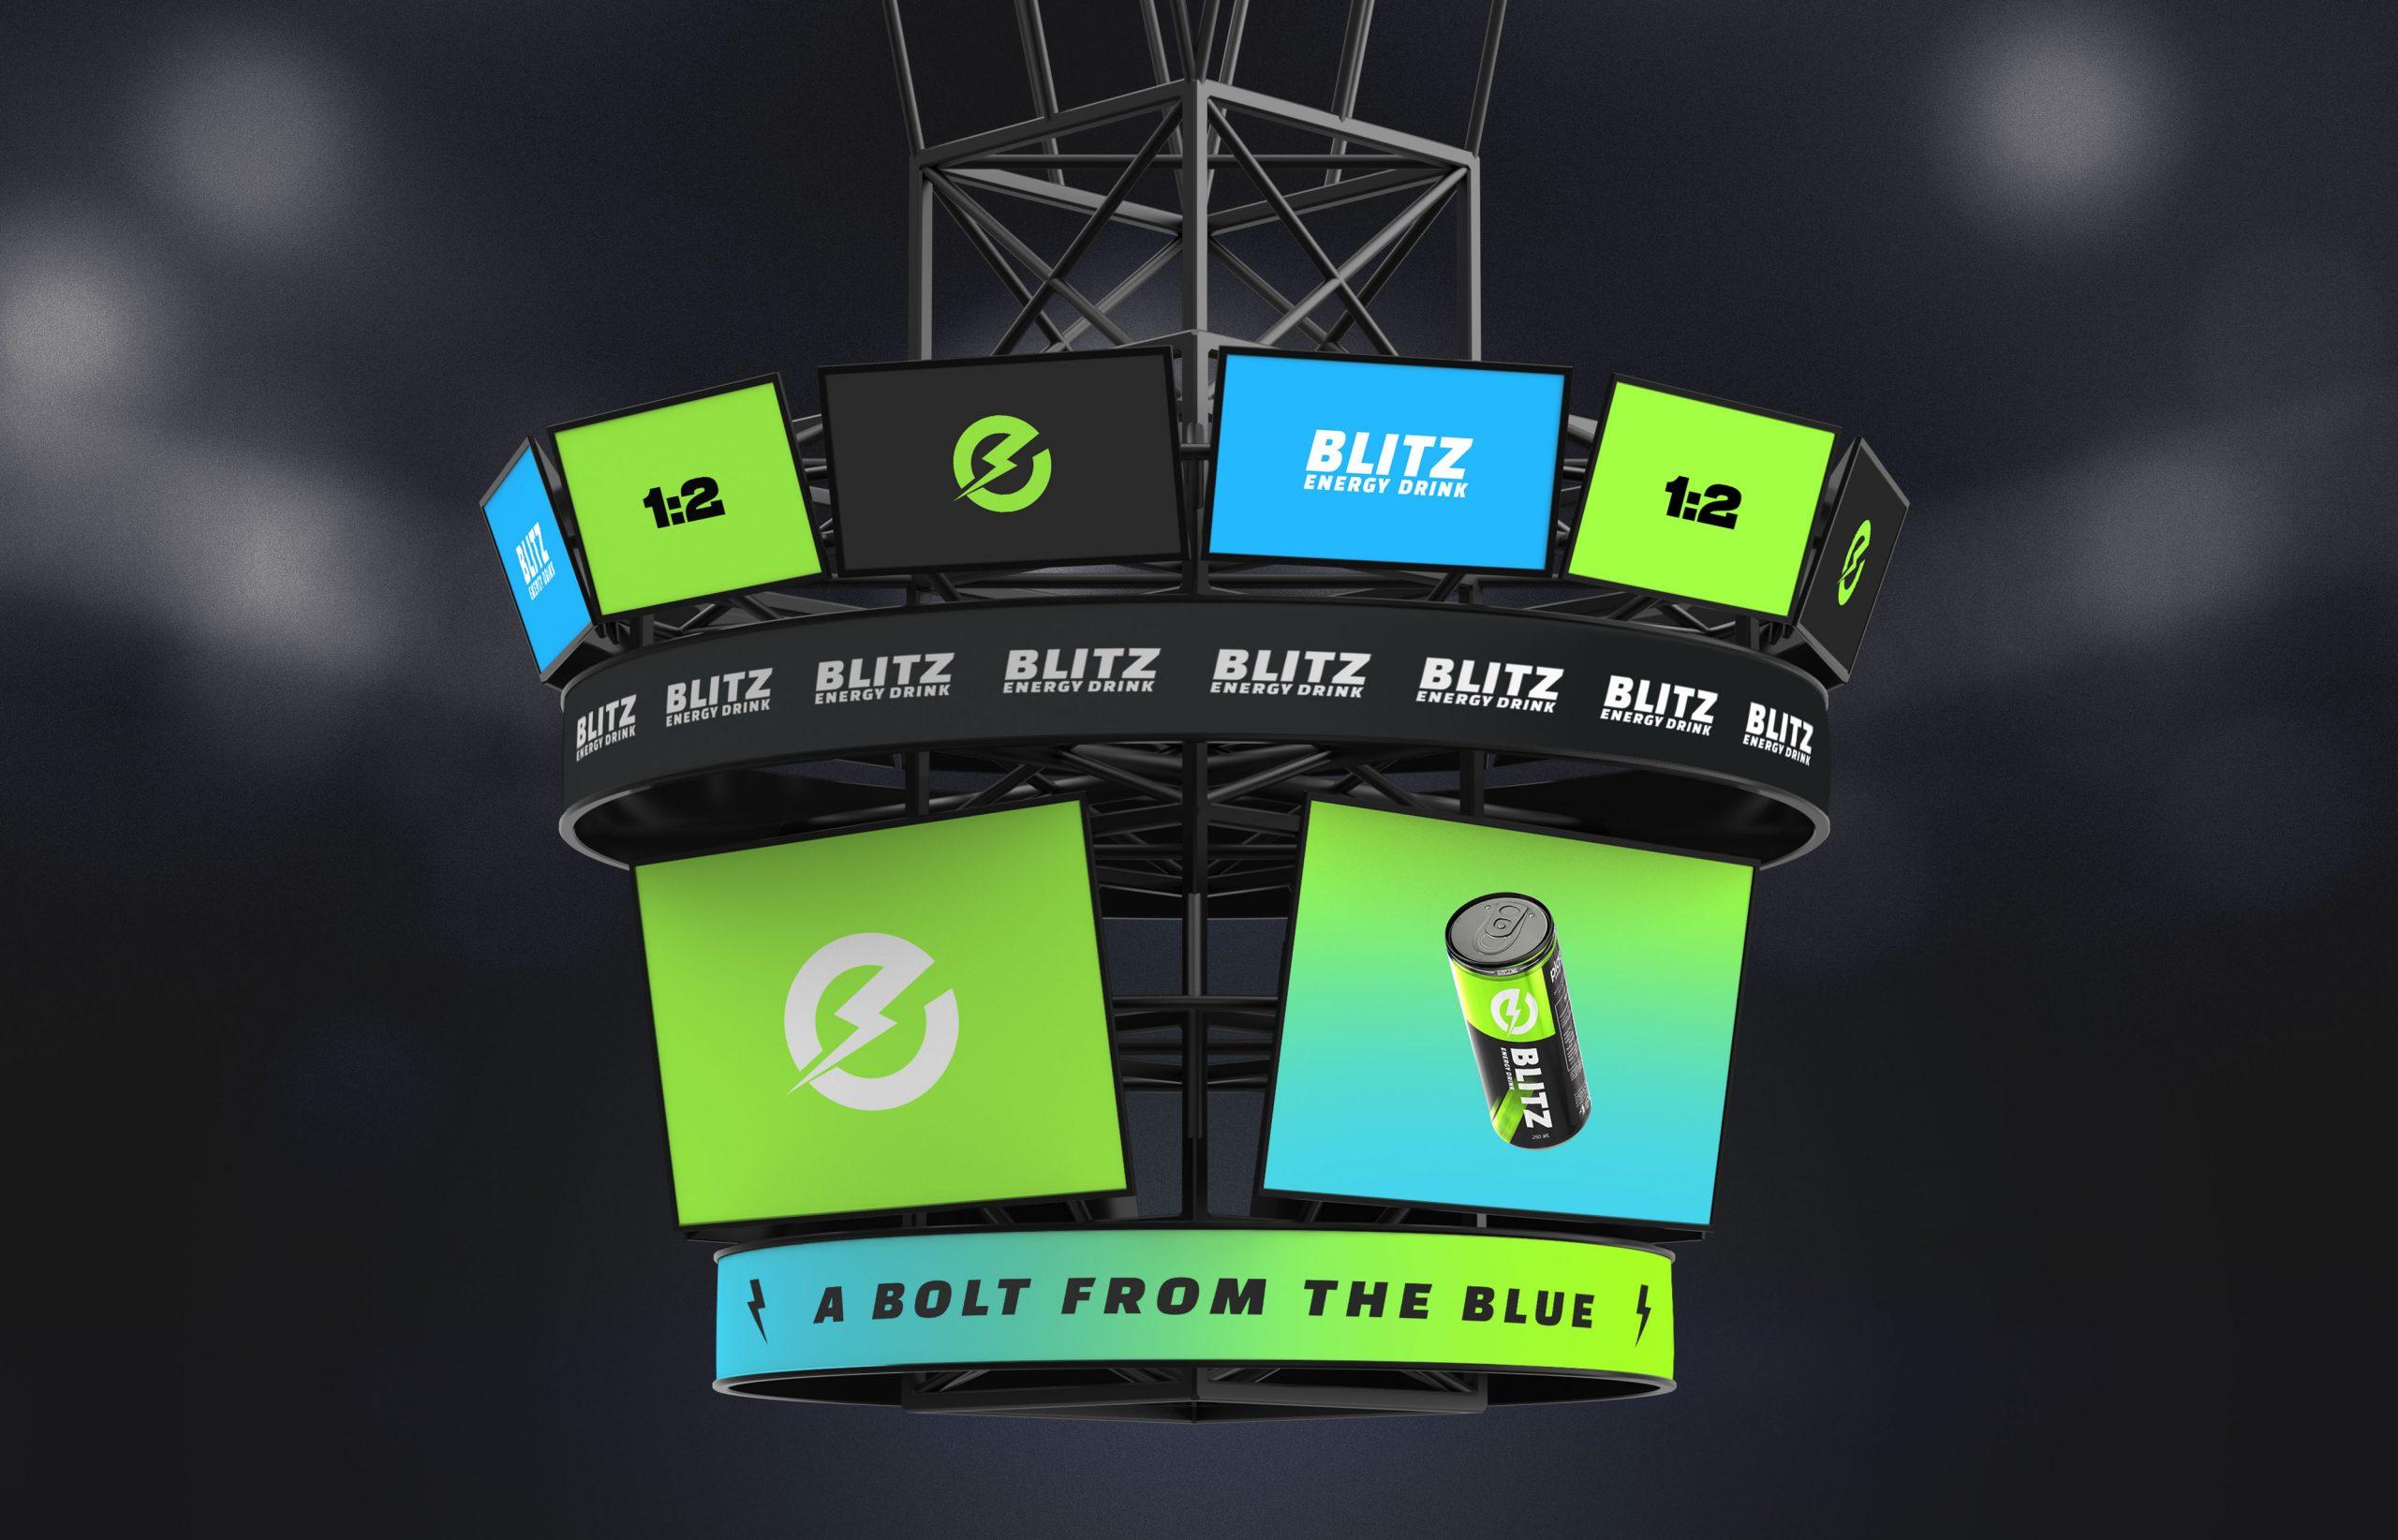 blitz-banner3